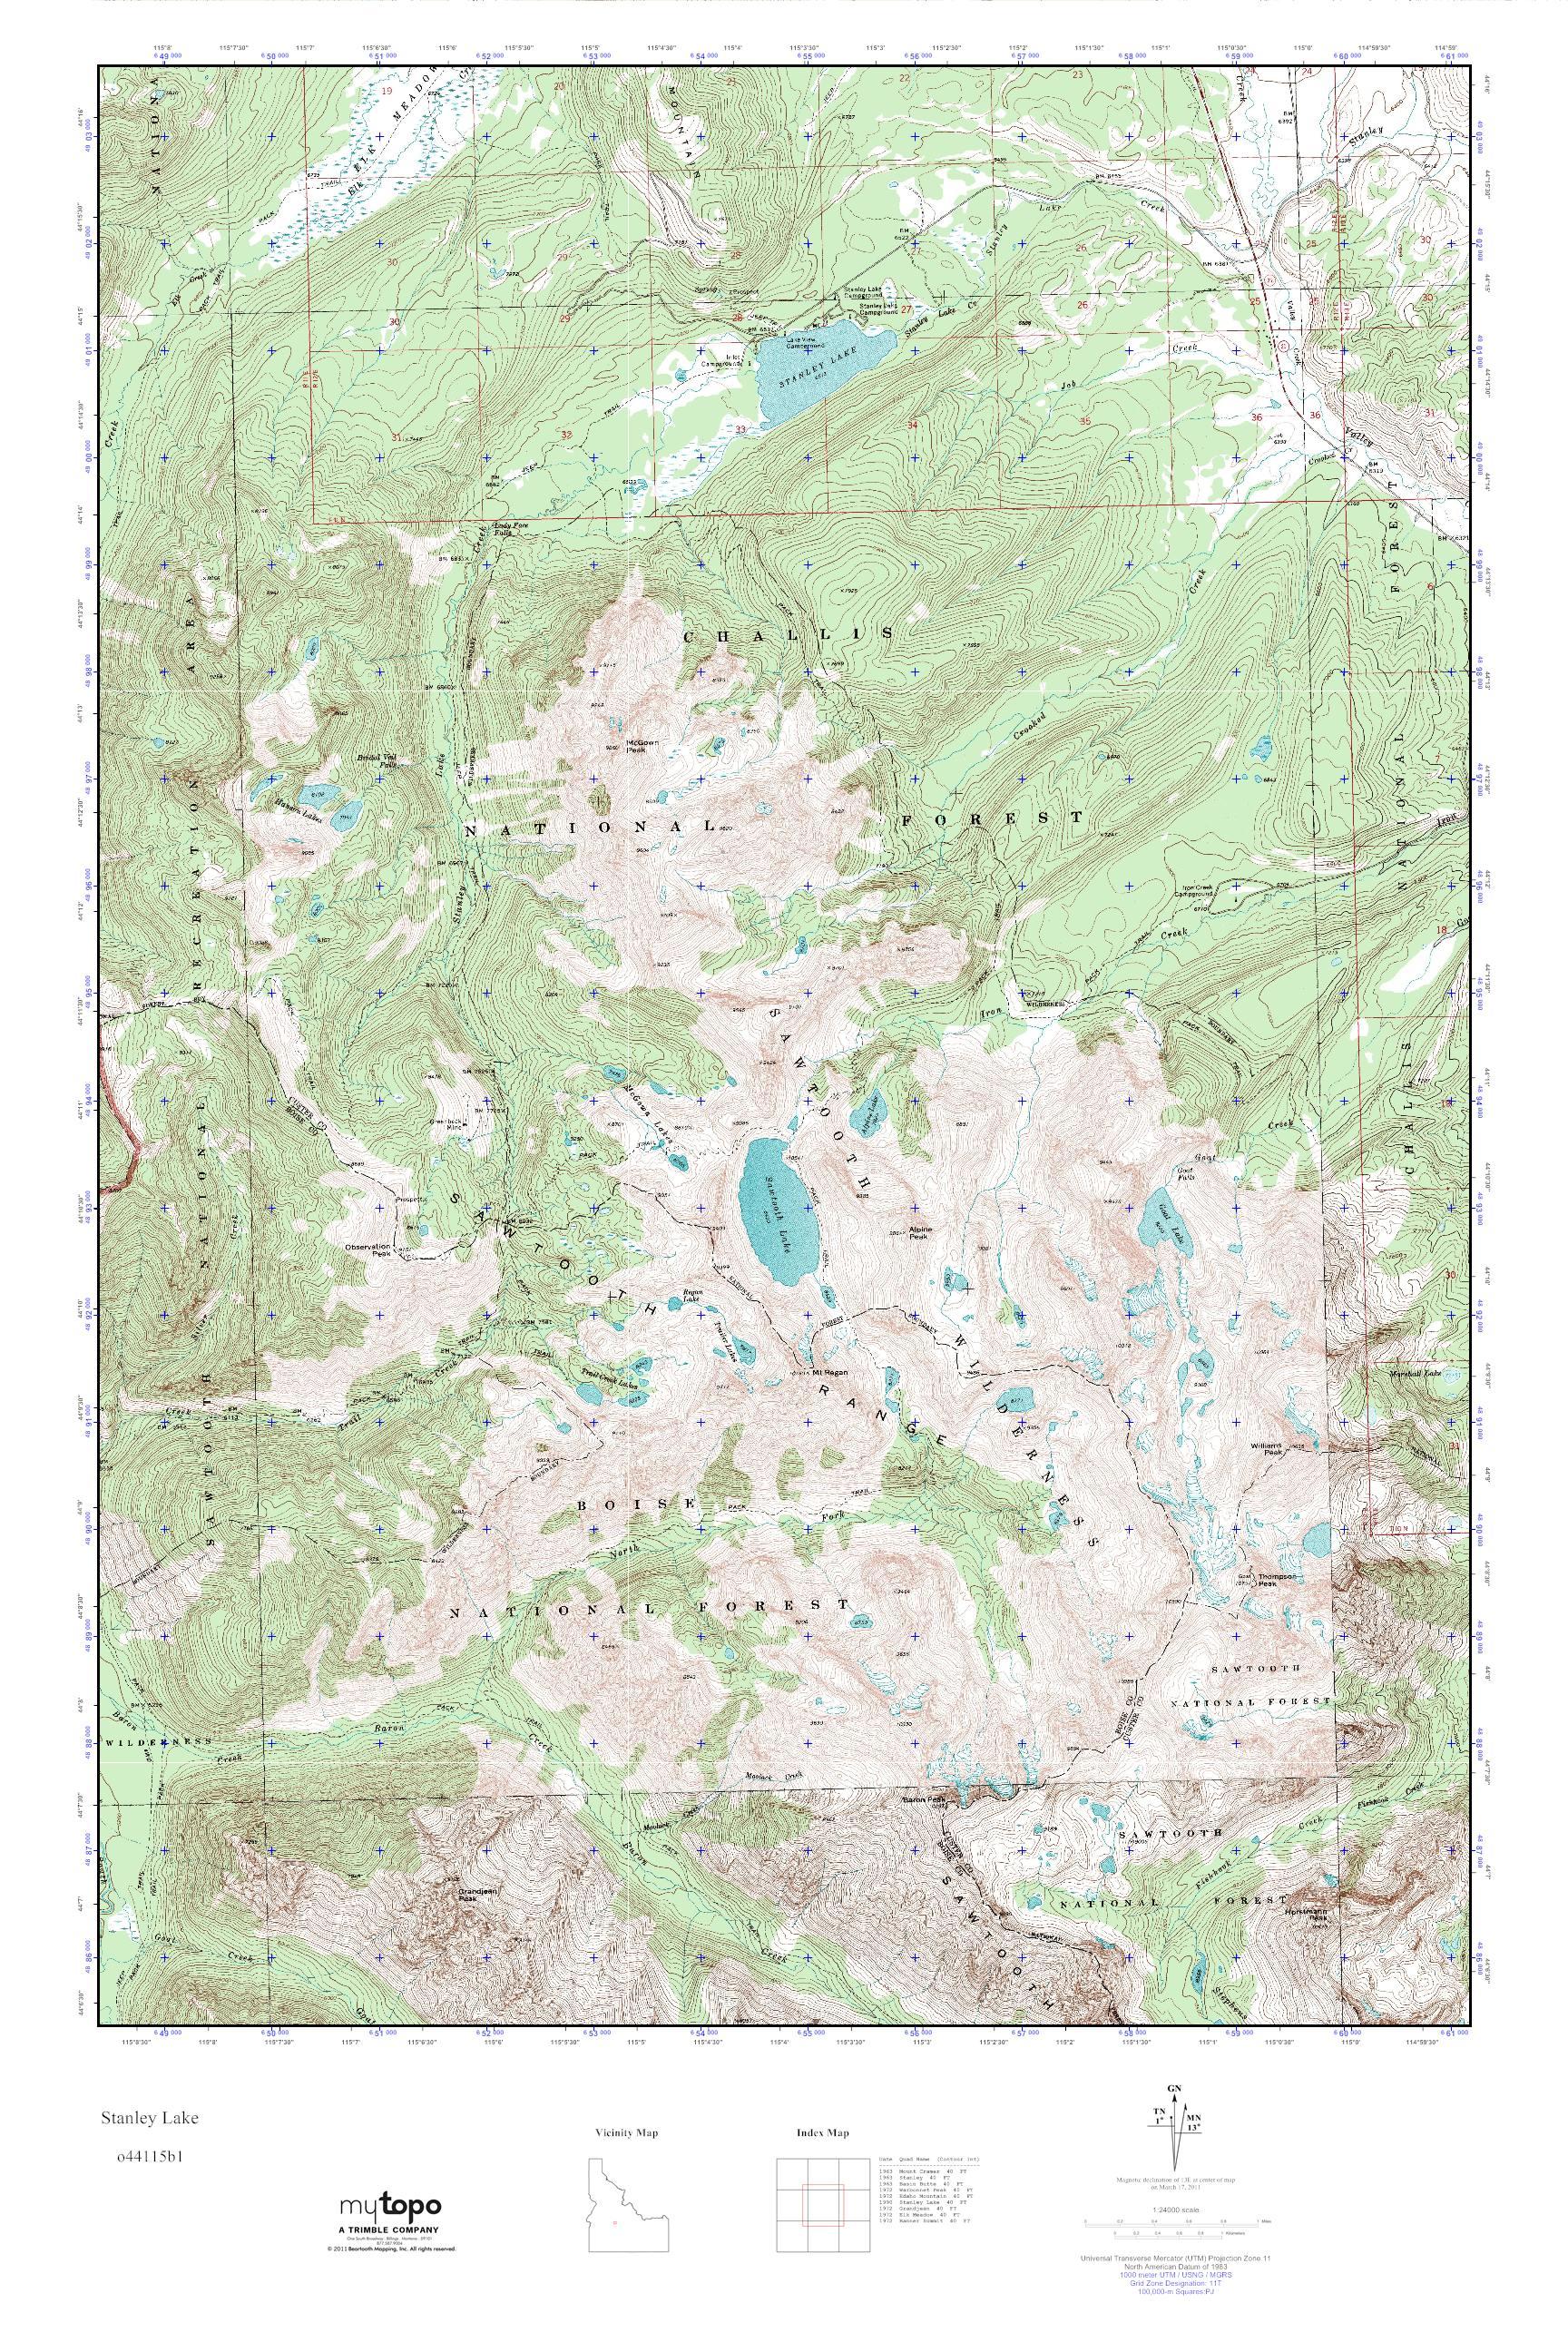 MyTopo Stanley Lake, Idaho USGS Quad Topo Map